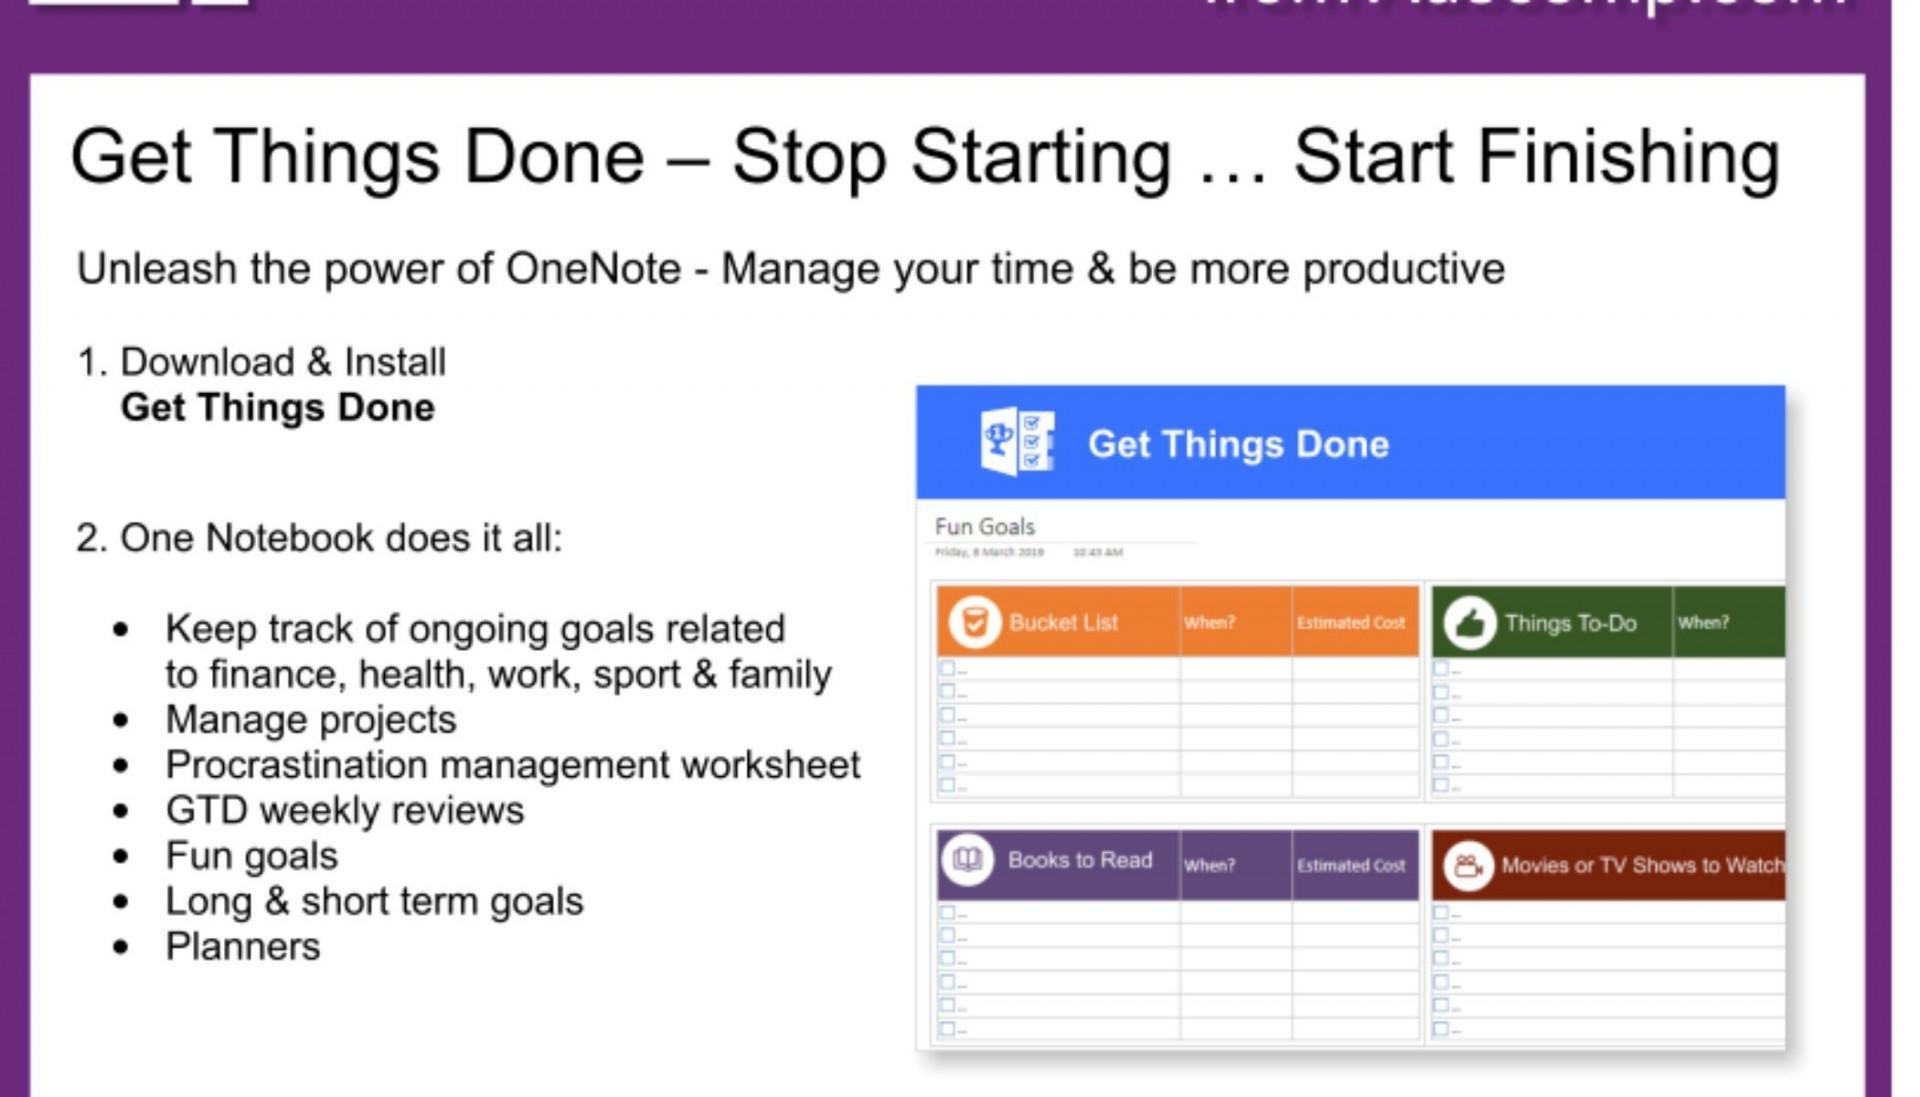 009 Amazing Onenote 2013 Project Management Template Concept 1920